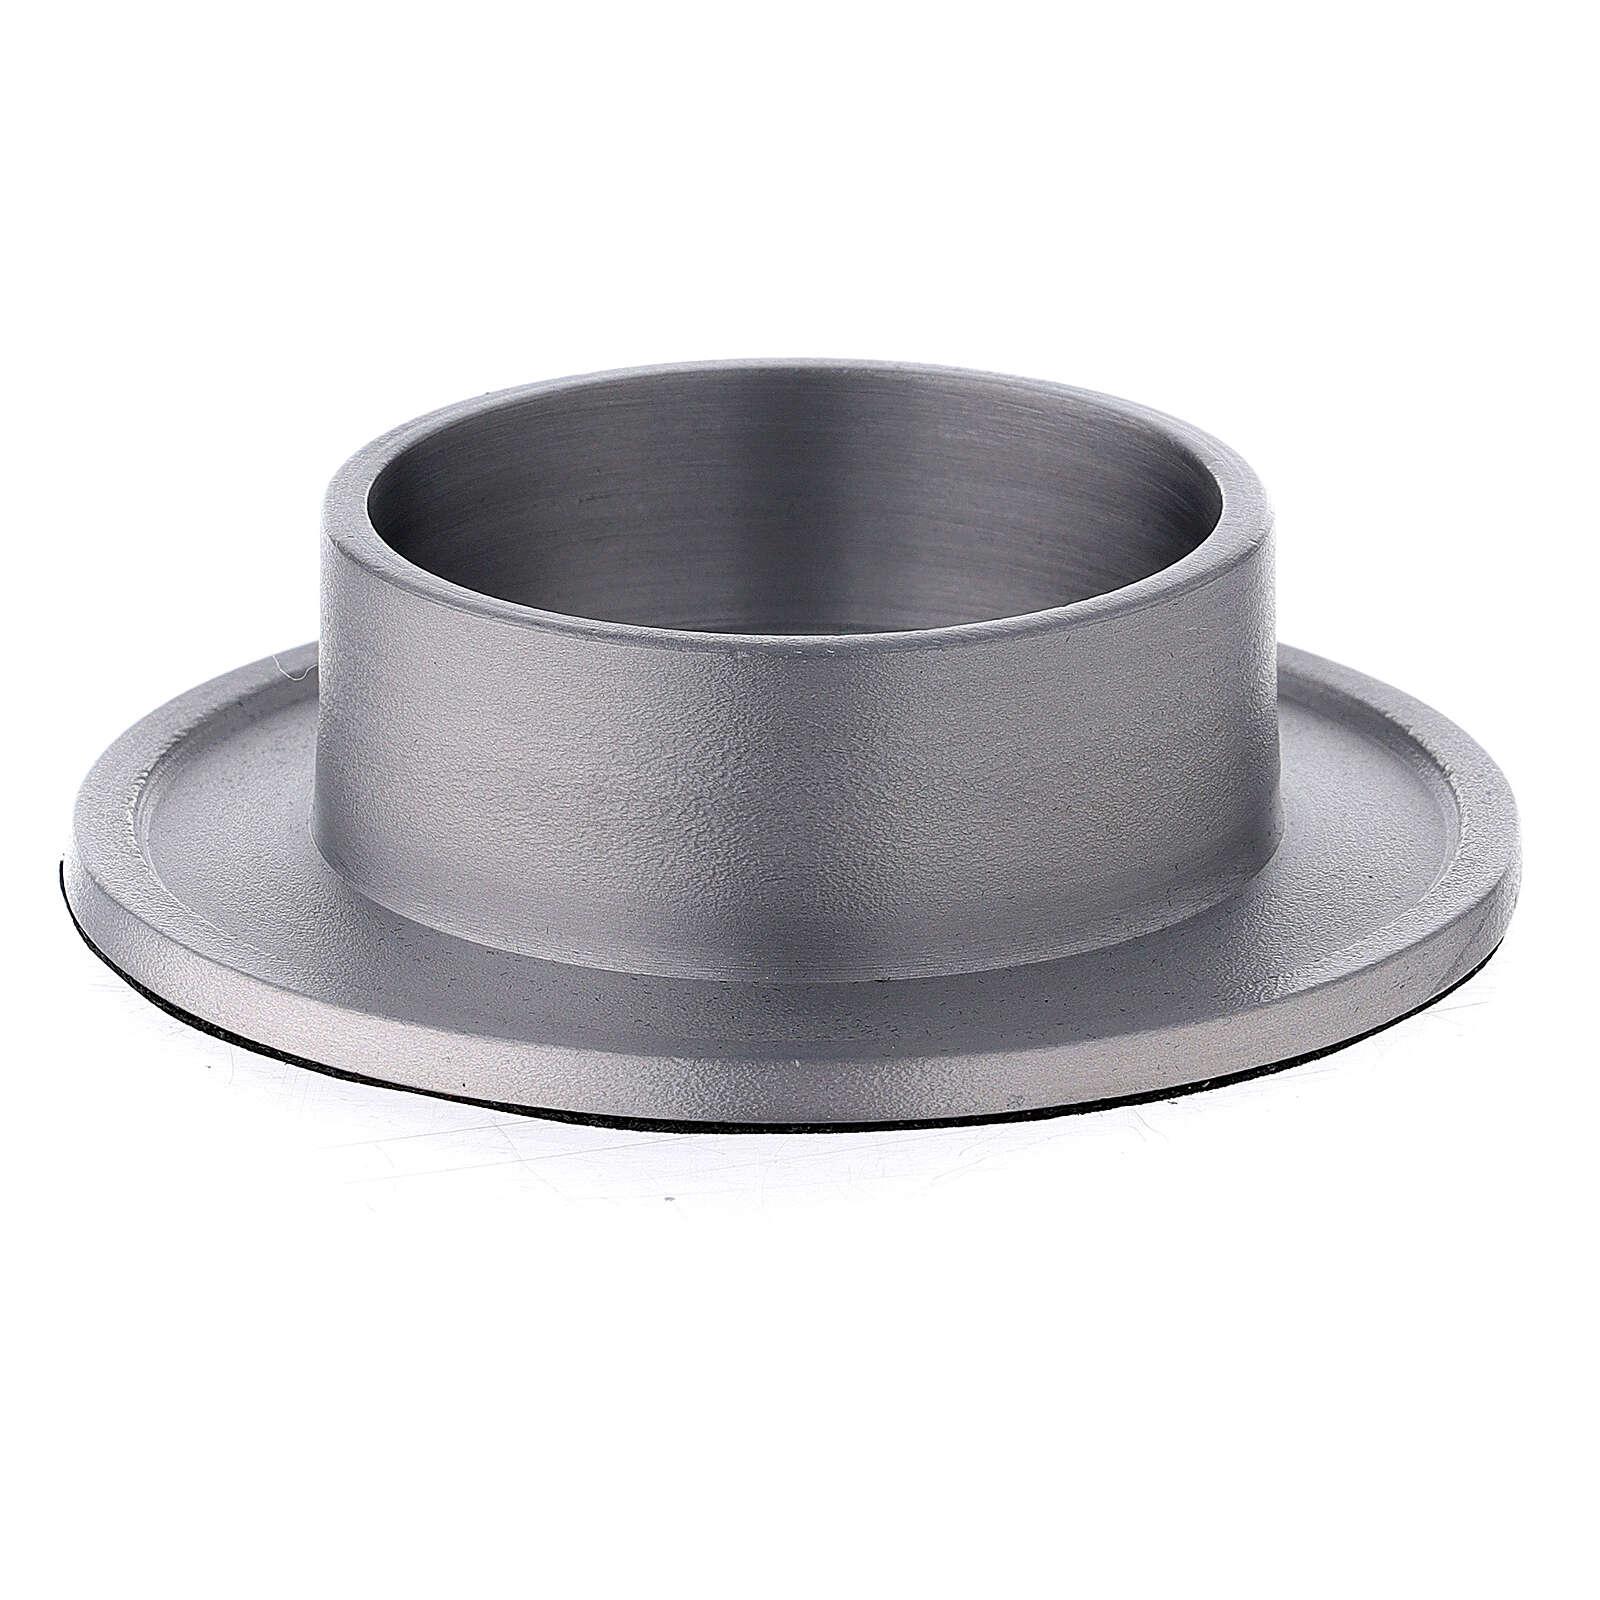 Base portacandela alluminio satinato 6 cm 3